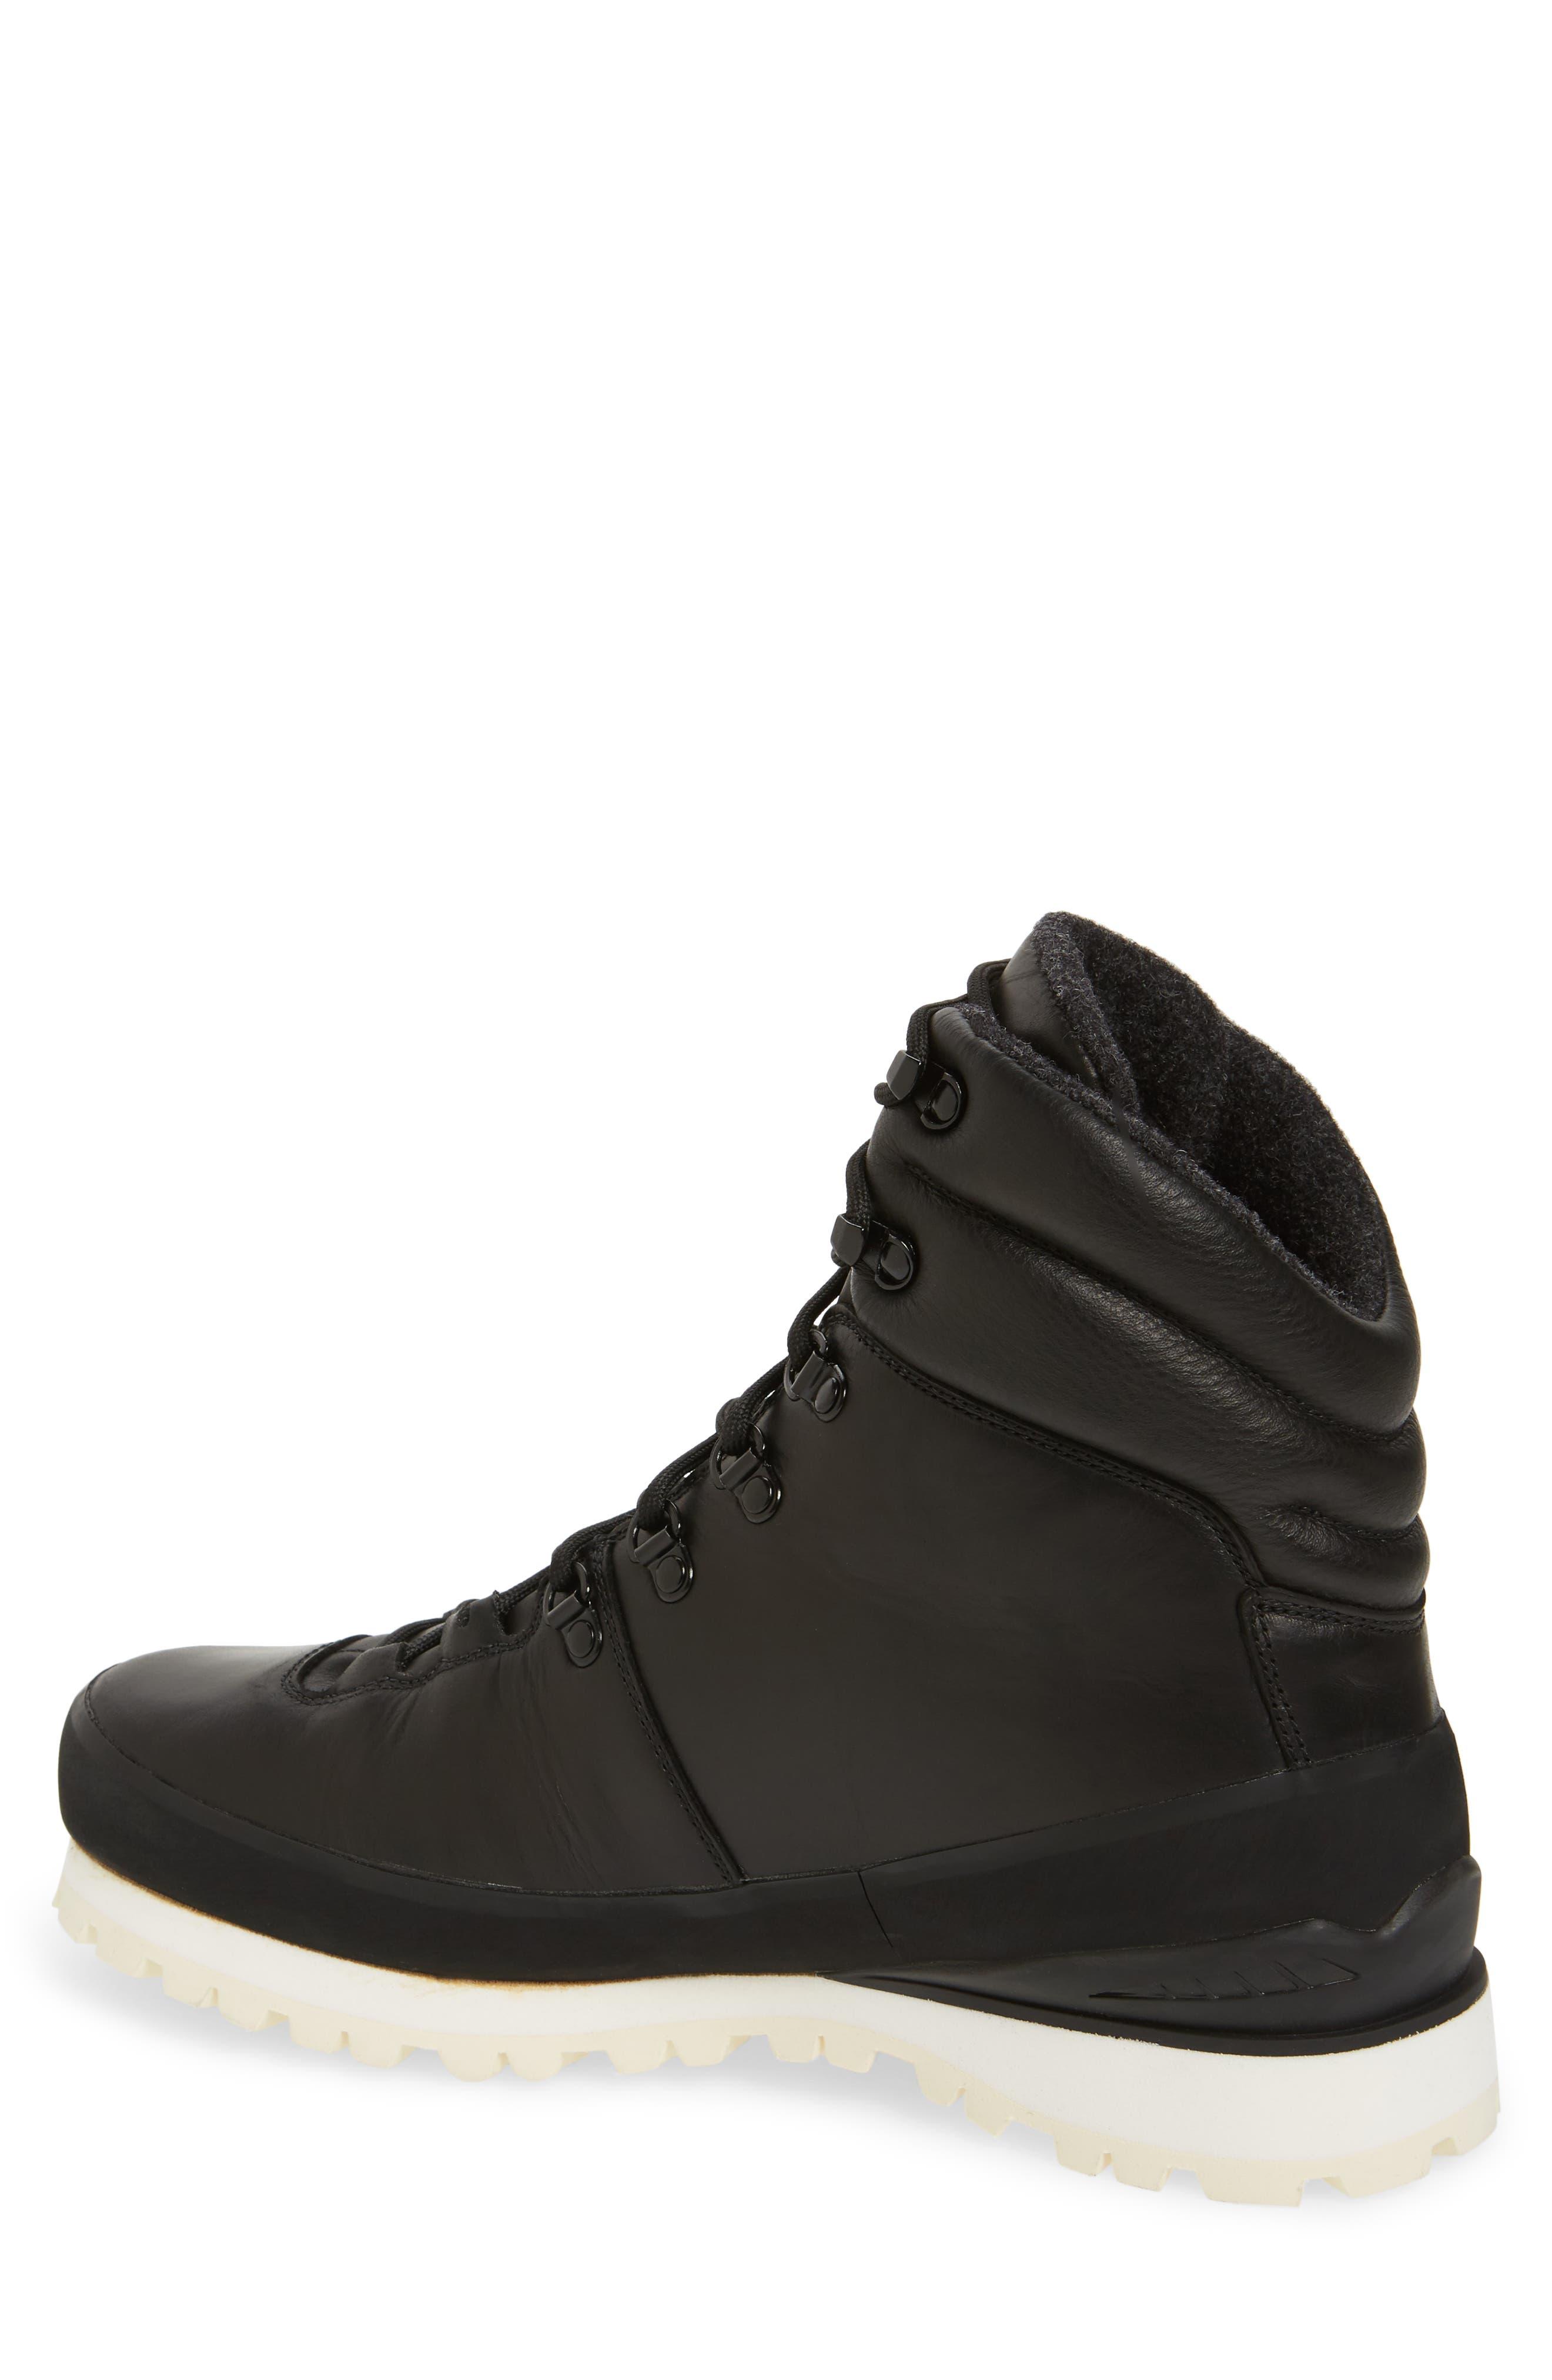 Cryos Hiker Boot,                             Alternate thumbnail 2, color,                             Tnf Black/ Tnf White